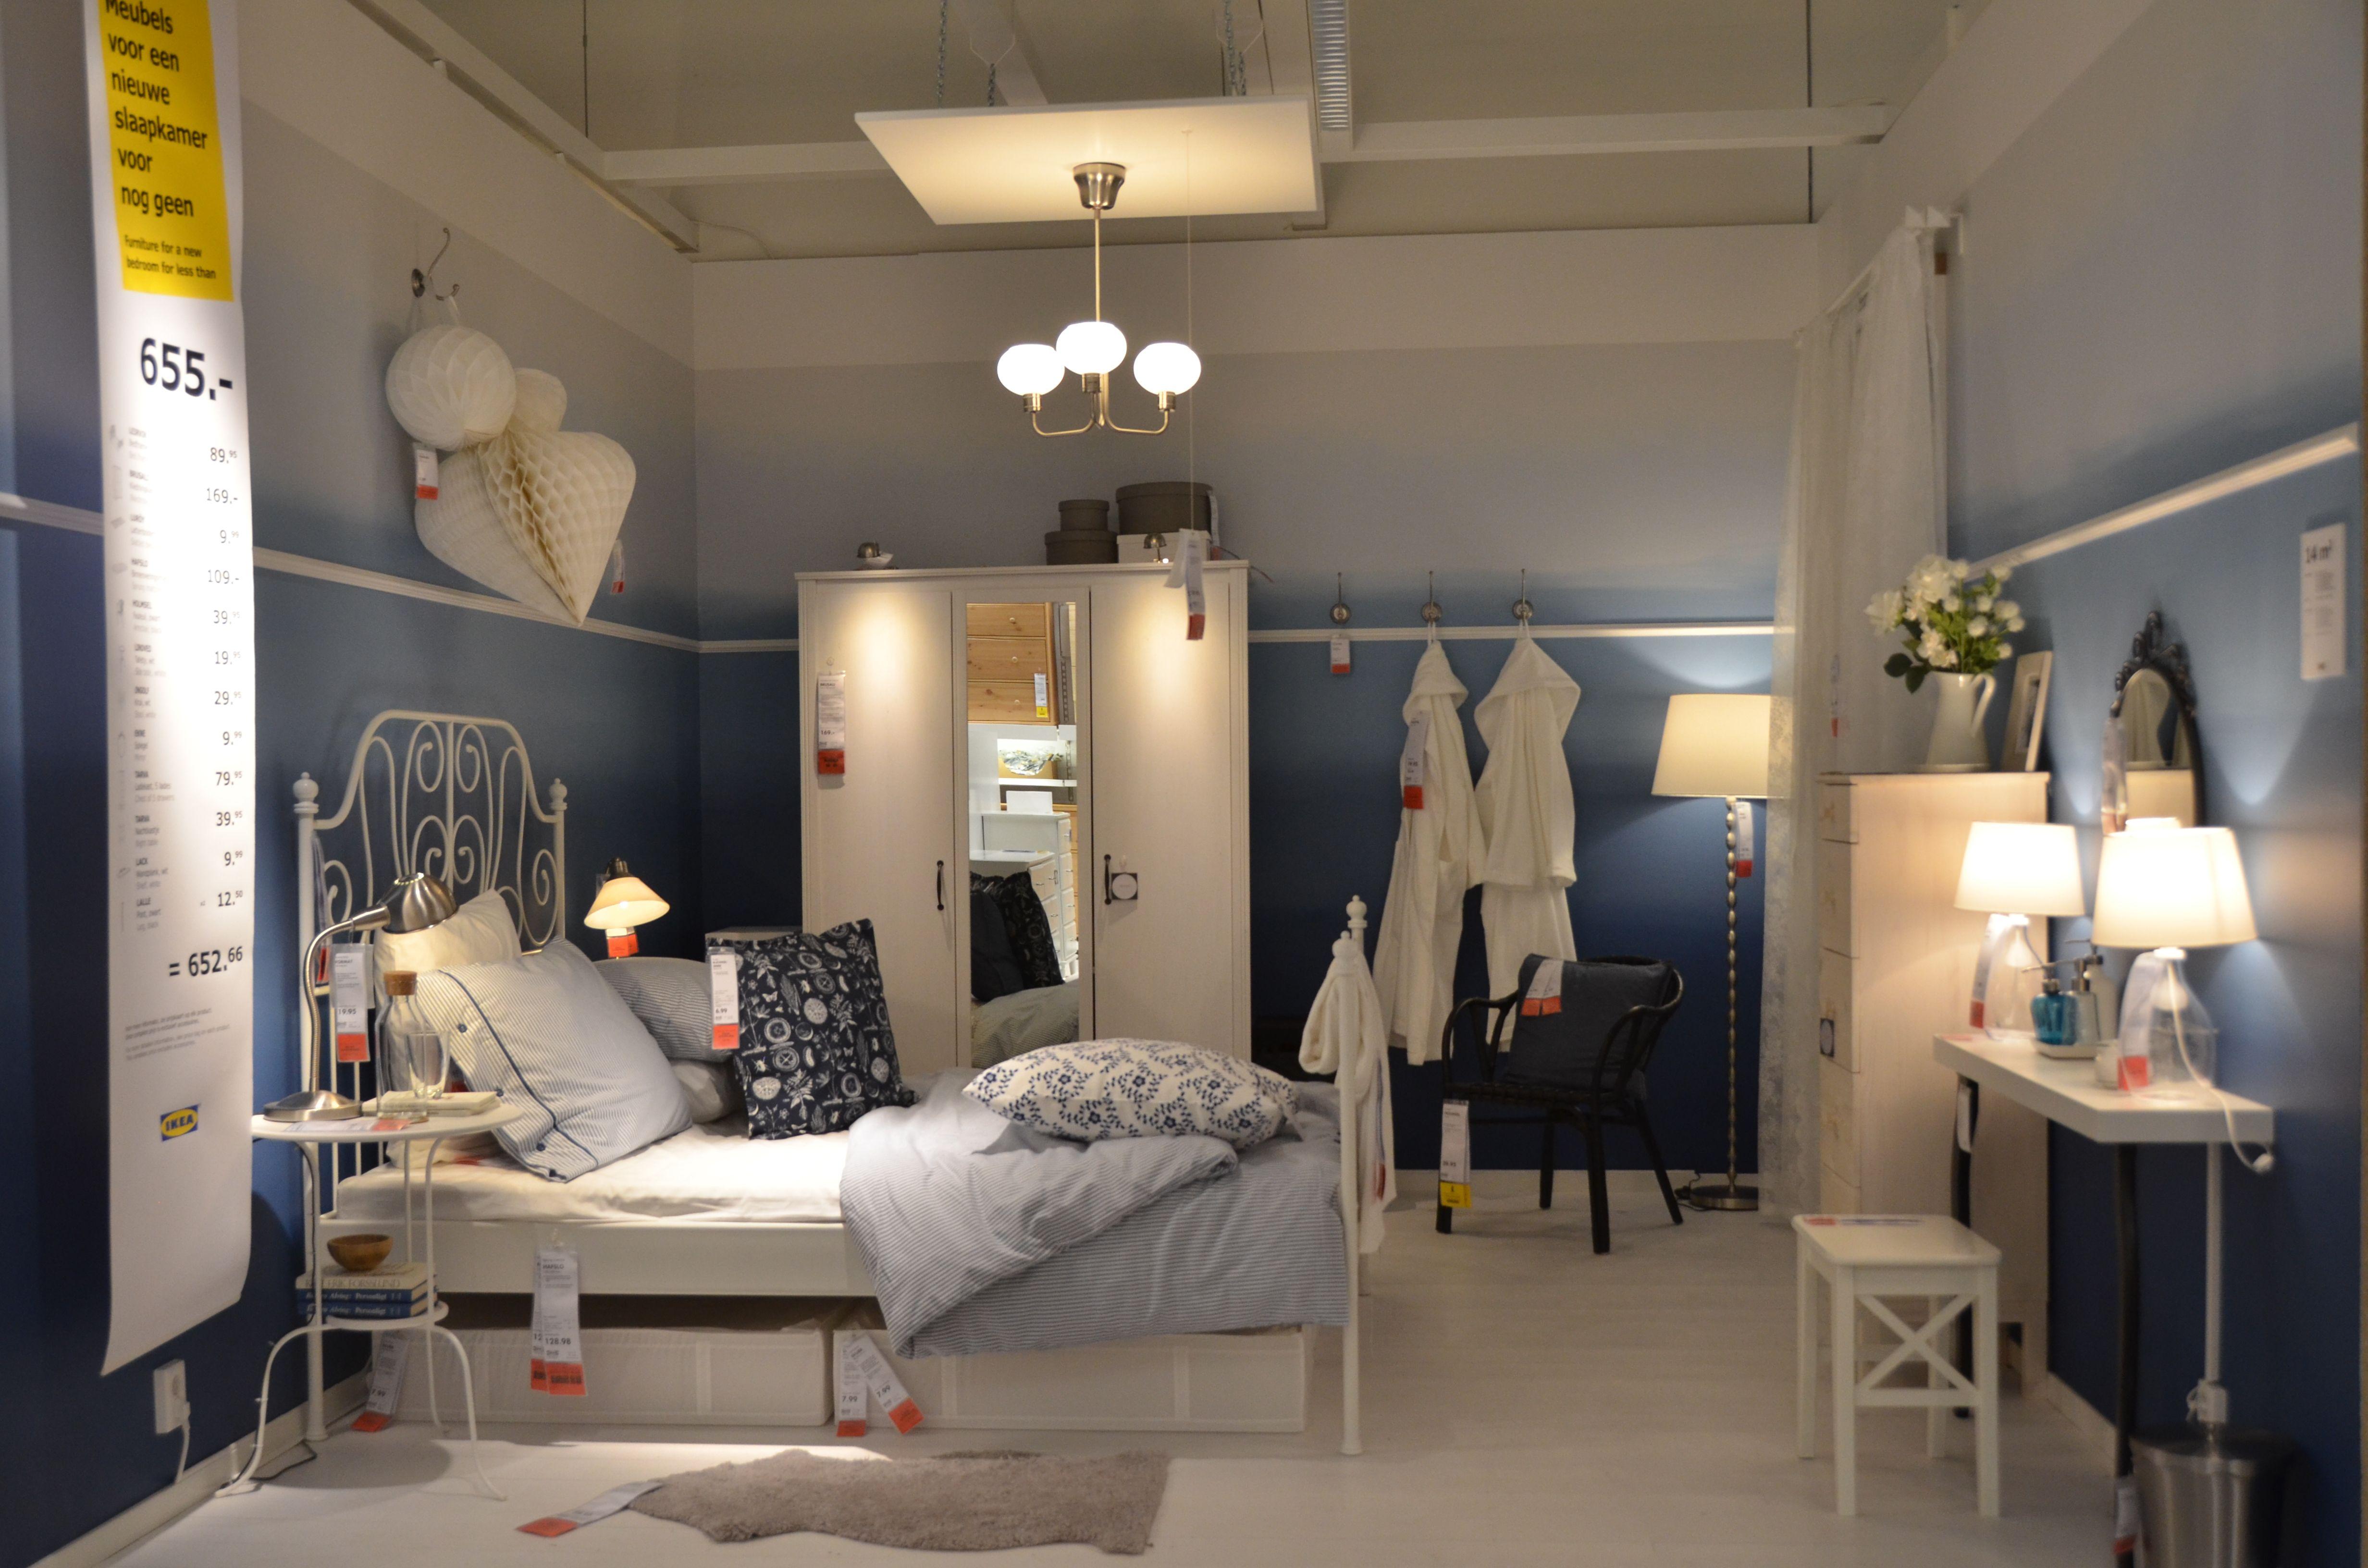 IKEA Delft   LEIRVIK bed frame   BRUSALI wardrobe   blue and white ...